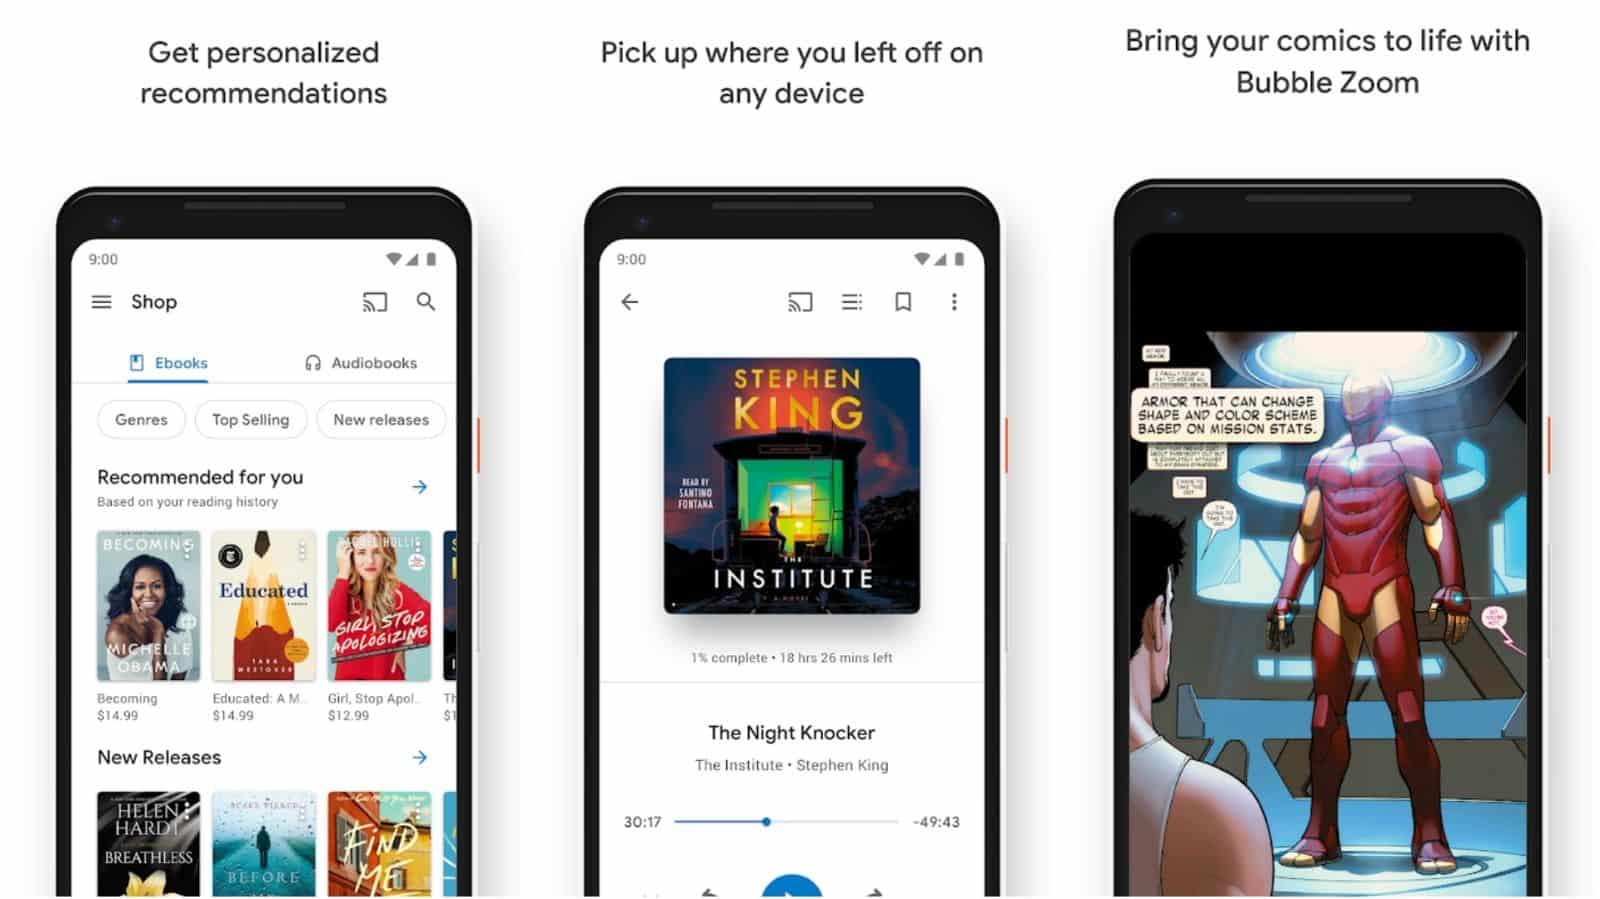 Google Play Books app grid image